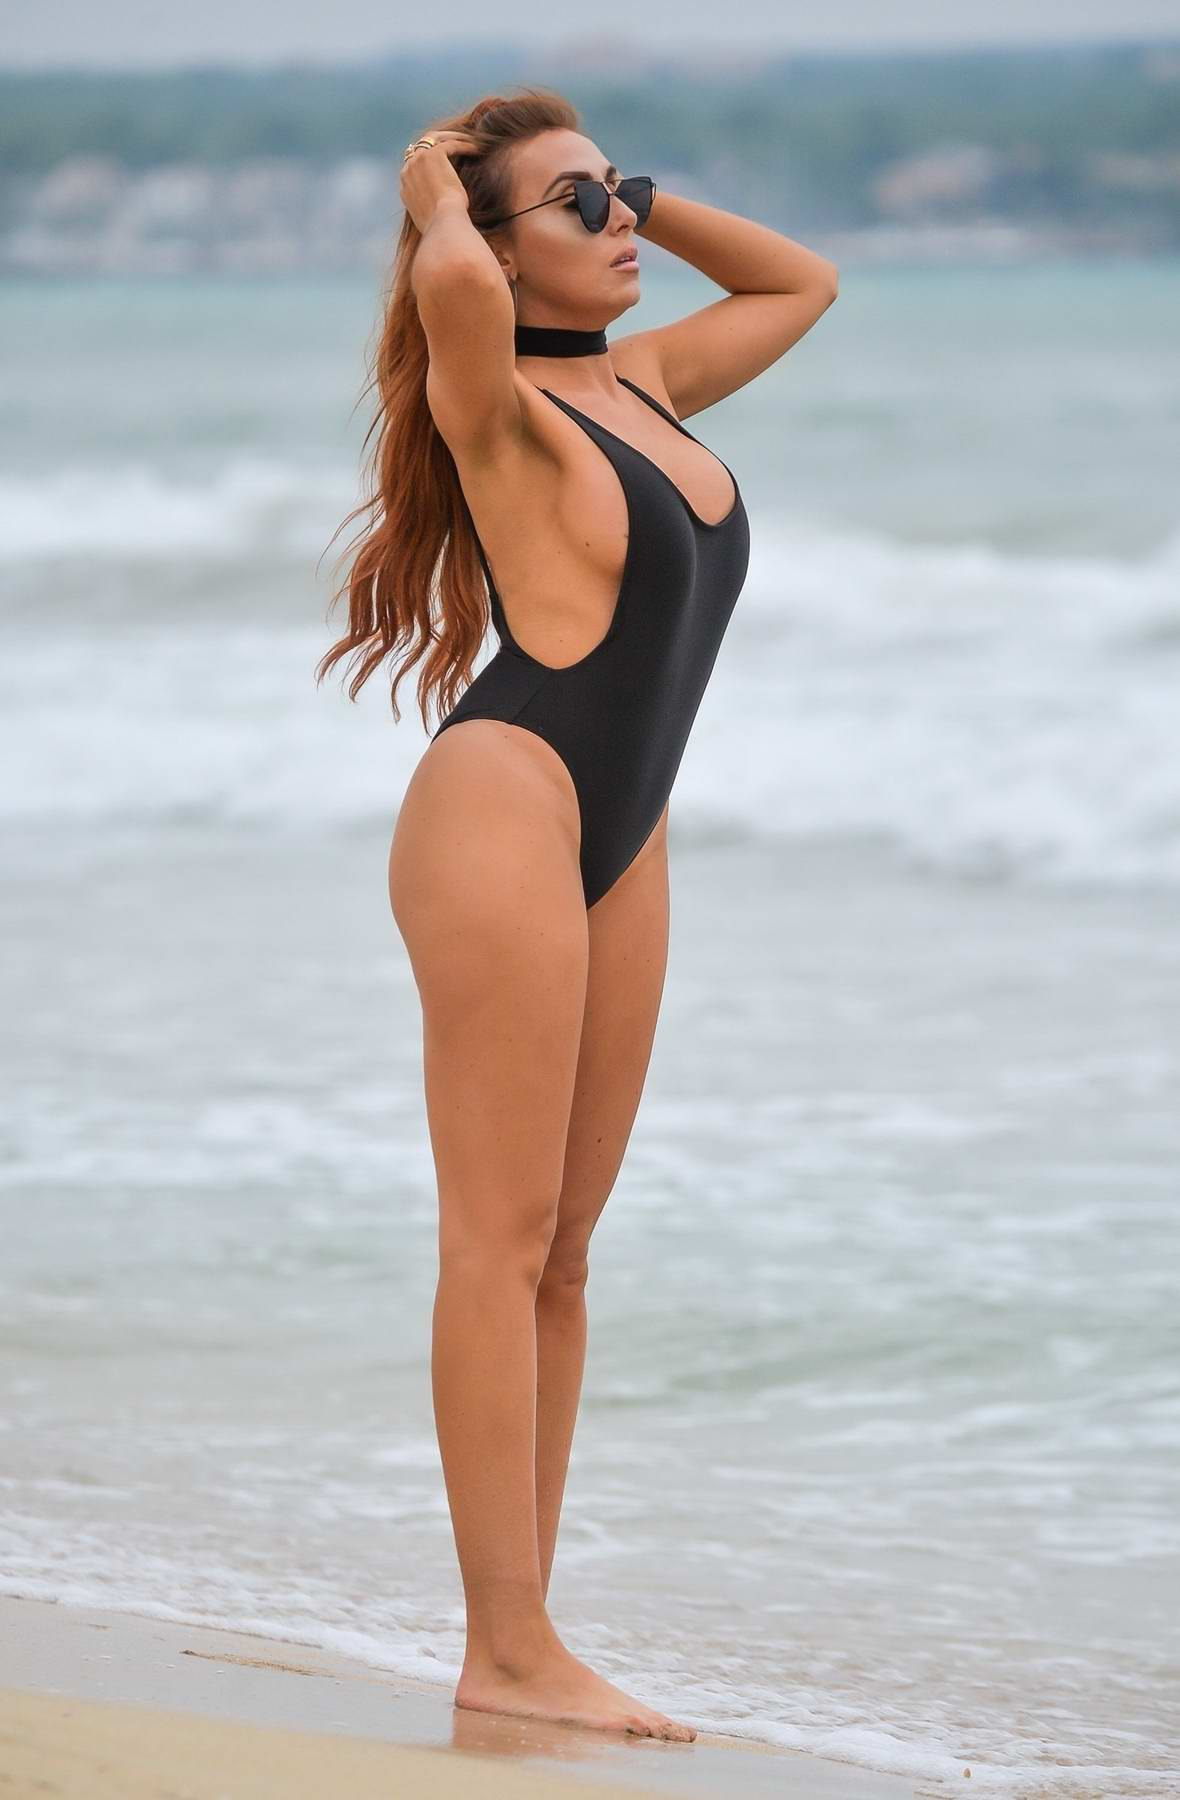 Laura Simpson in a black swimsuit enjoying the beach in Majorca, Spain